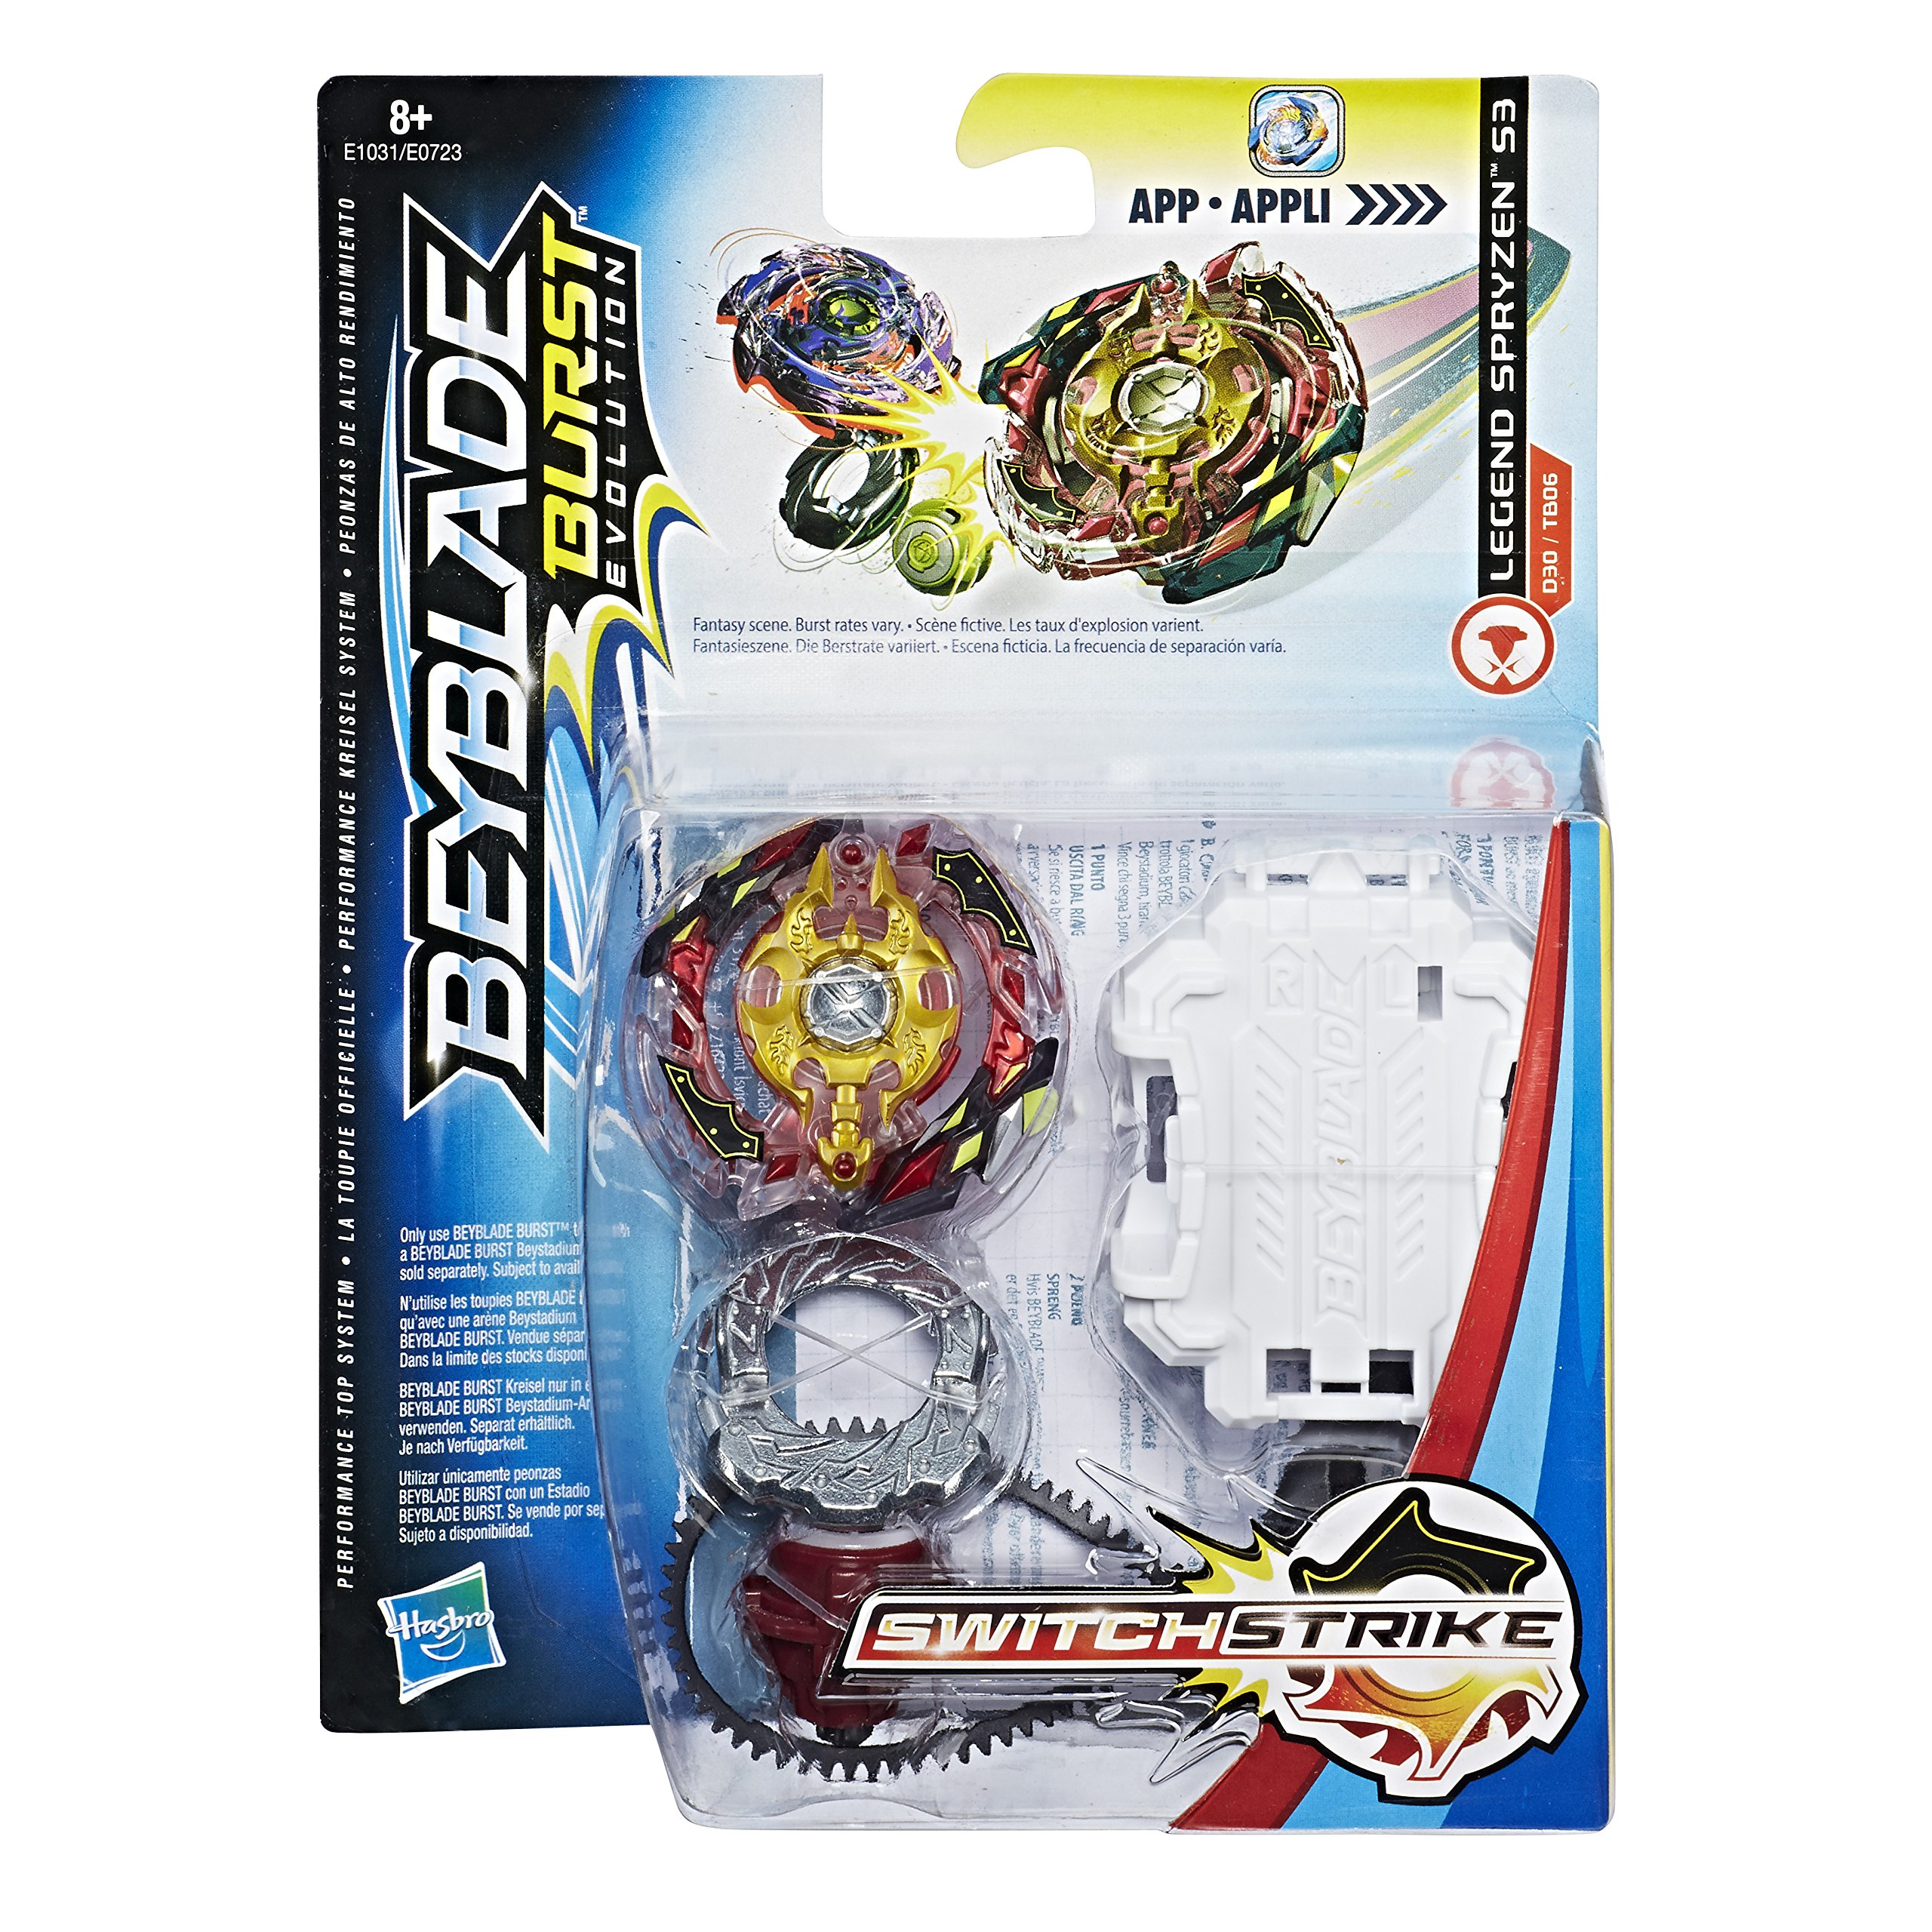 Beyblade - Pack de Demarrage - Spryzen S3 - E1031 product image